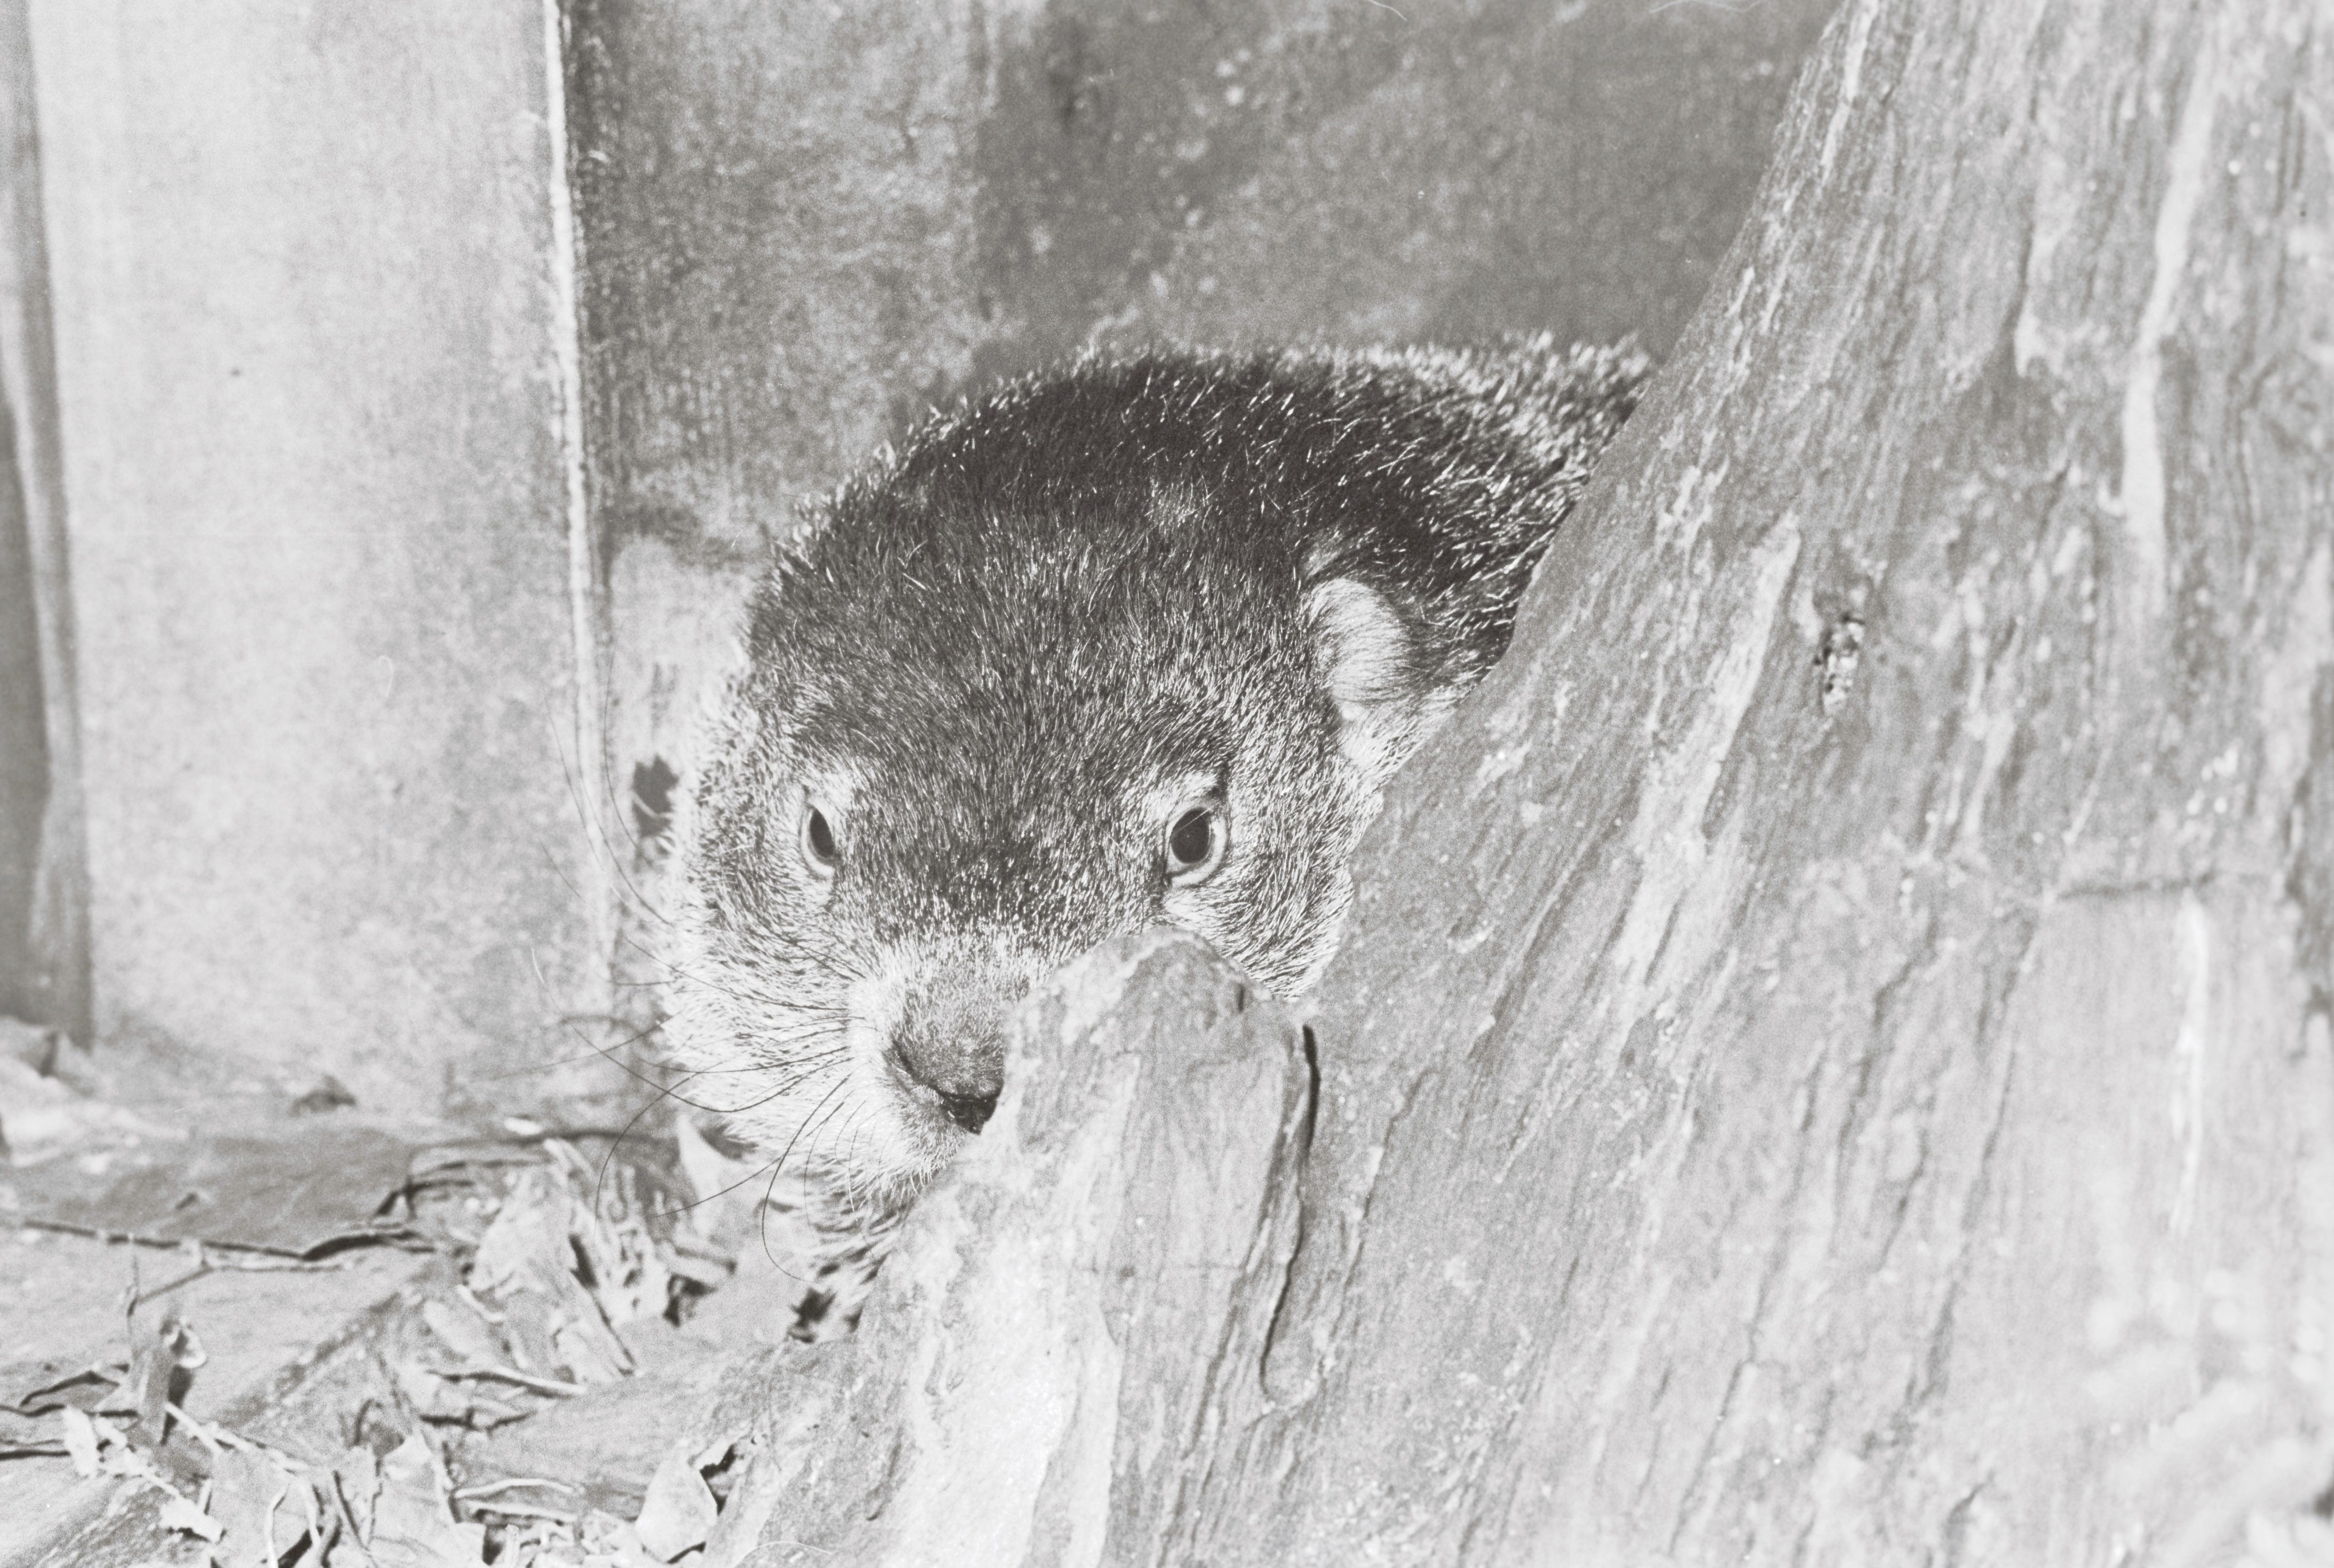 Punxsutawney Phil groundhog's day